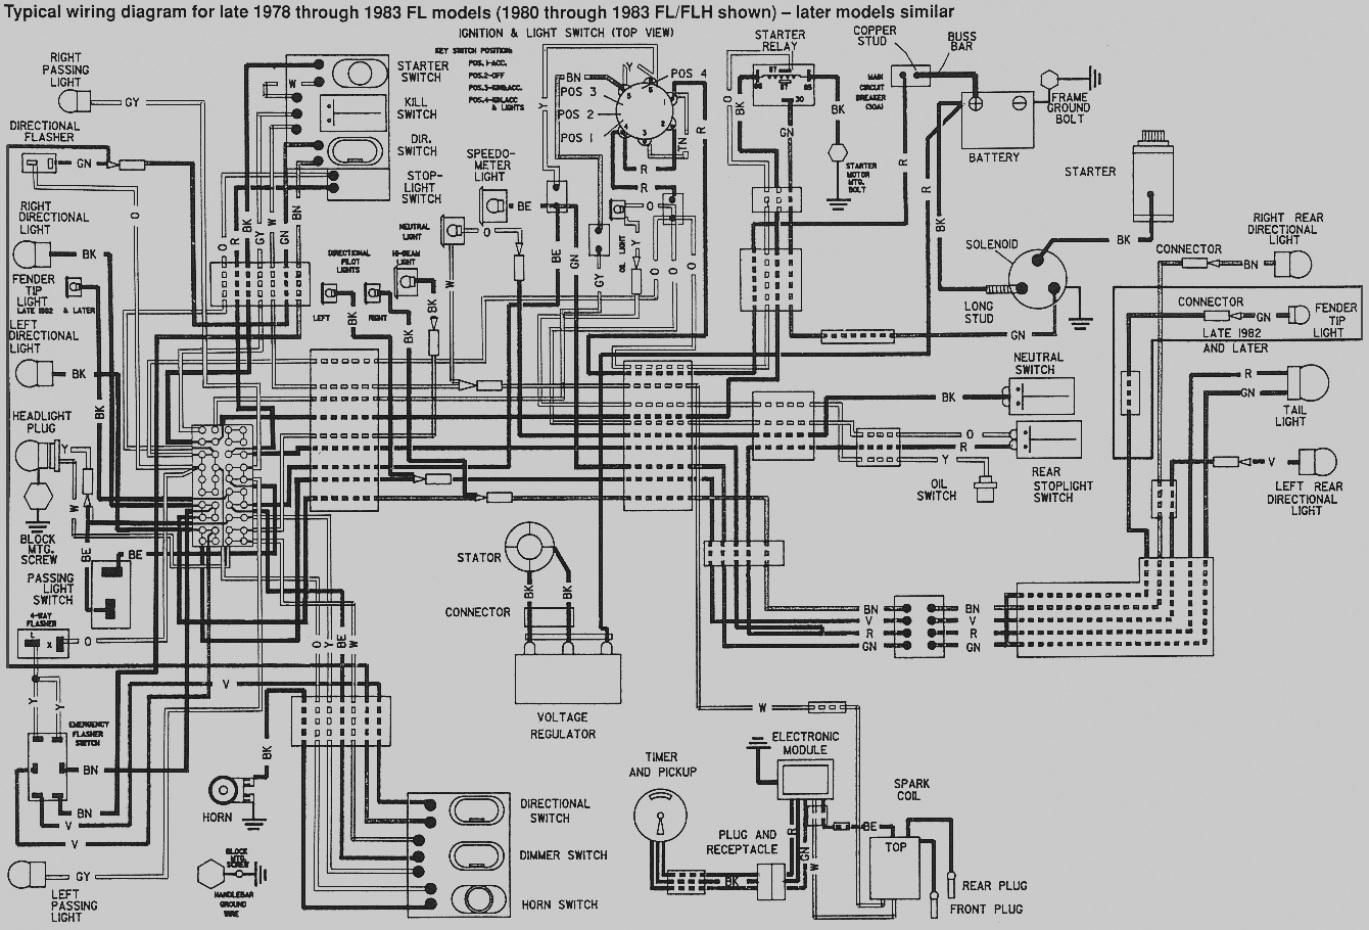 [DIAGRAM] 89 Sportster Wiring Diagram FULL Version HD